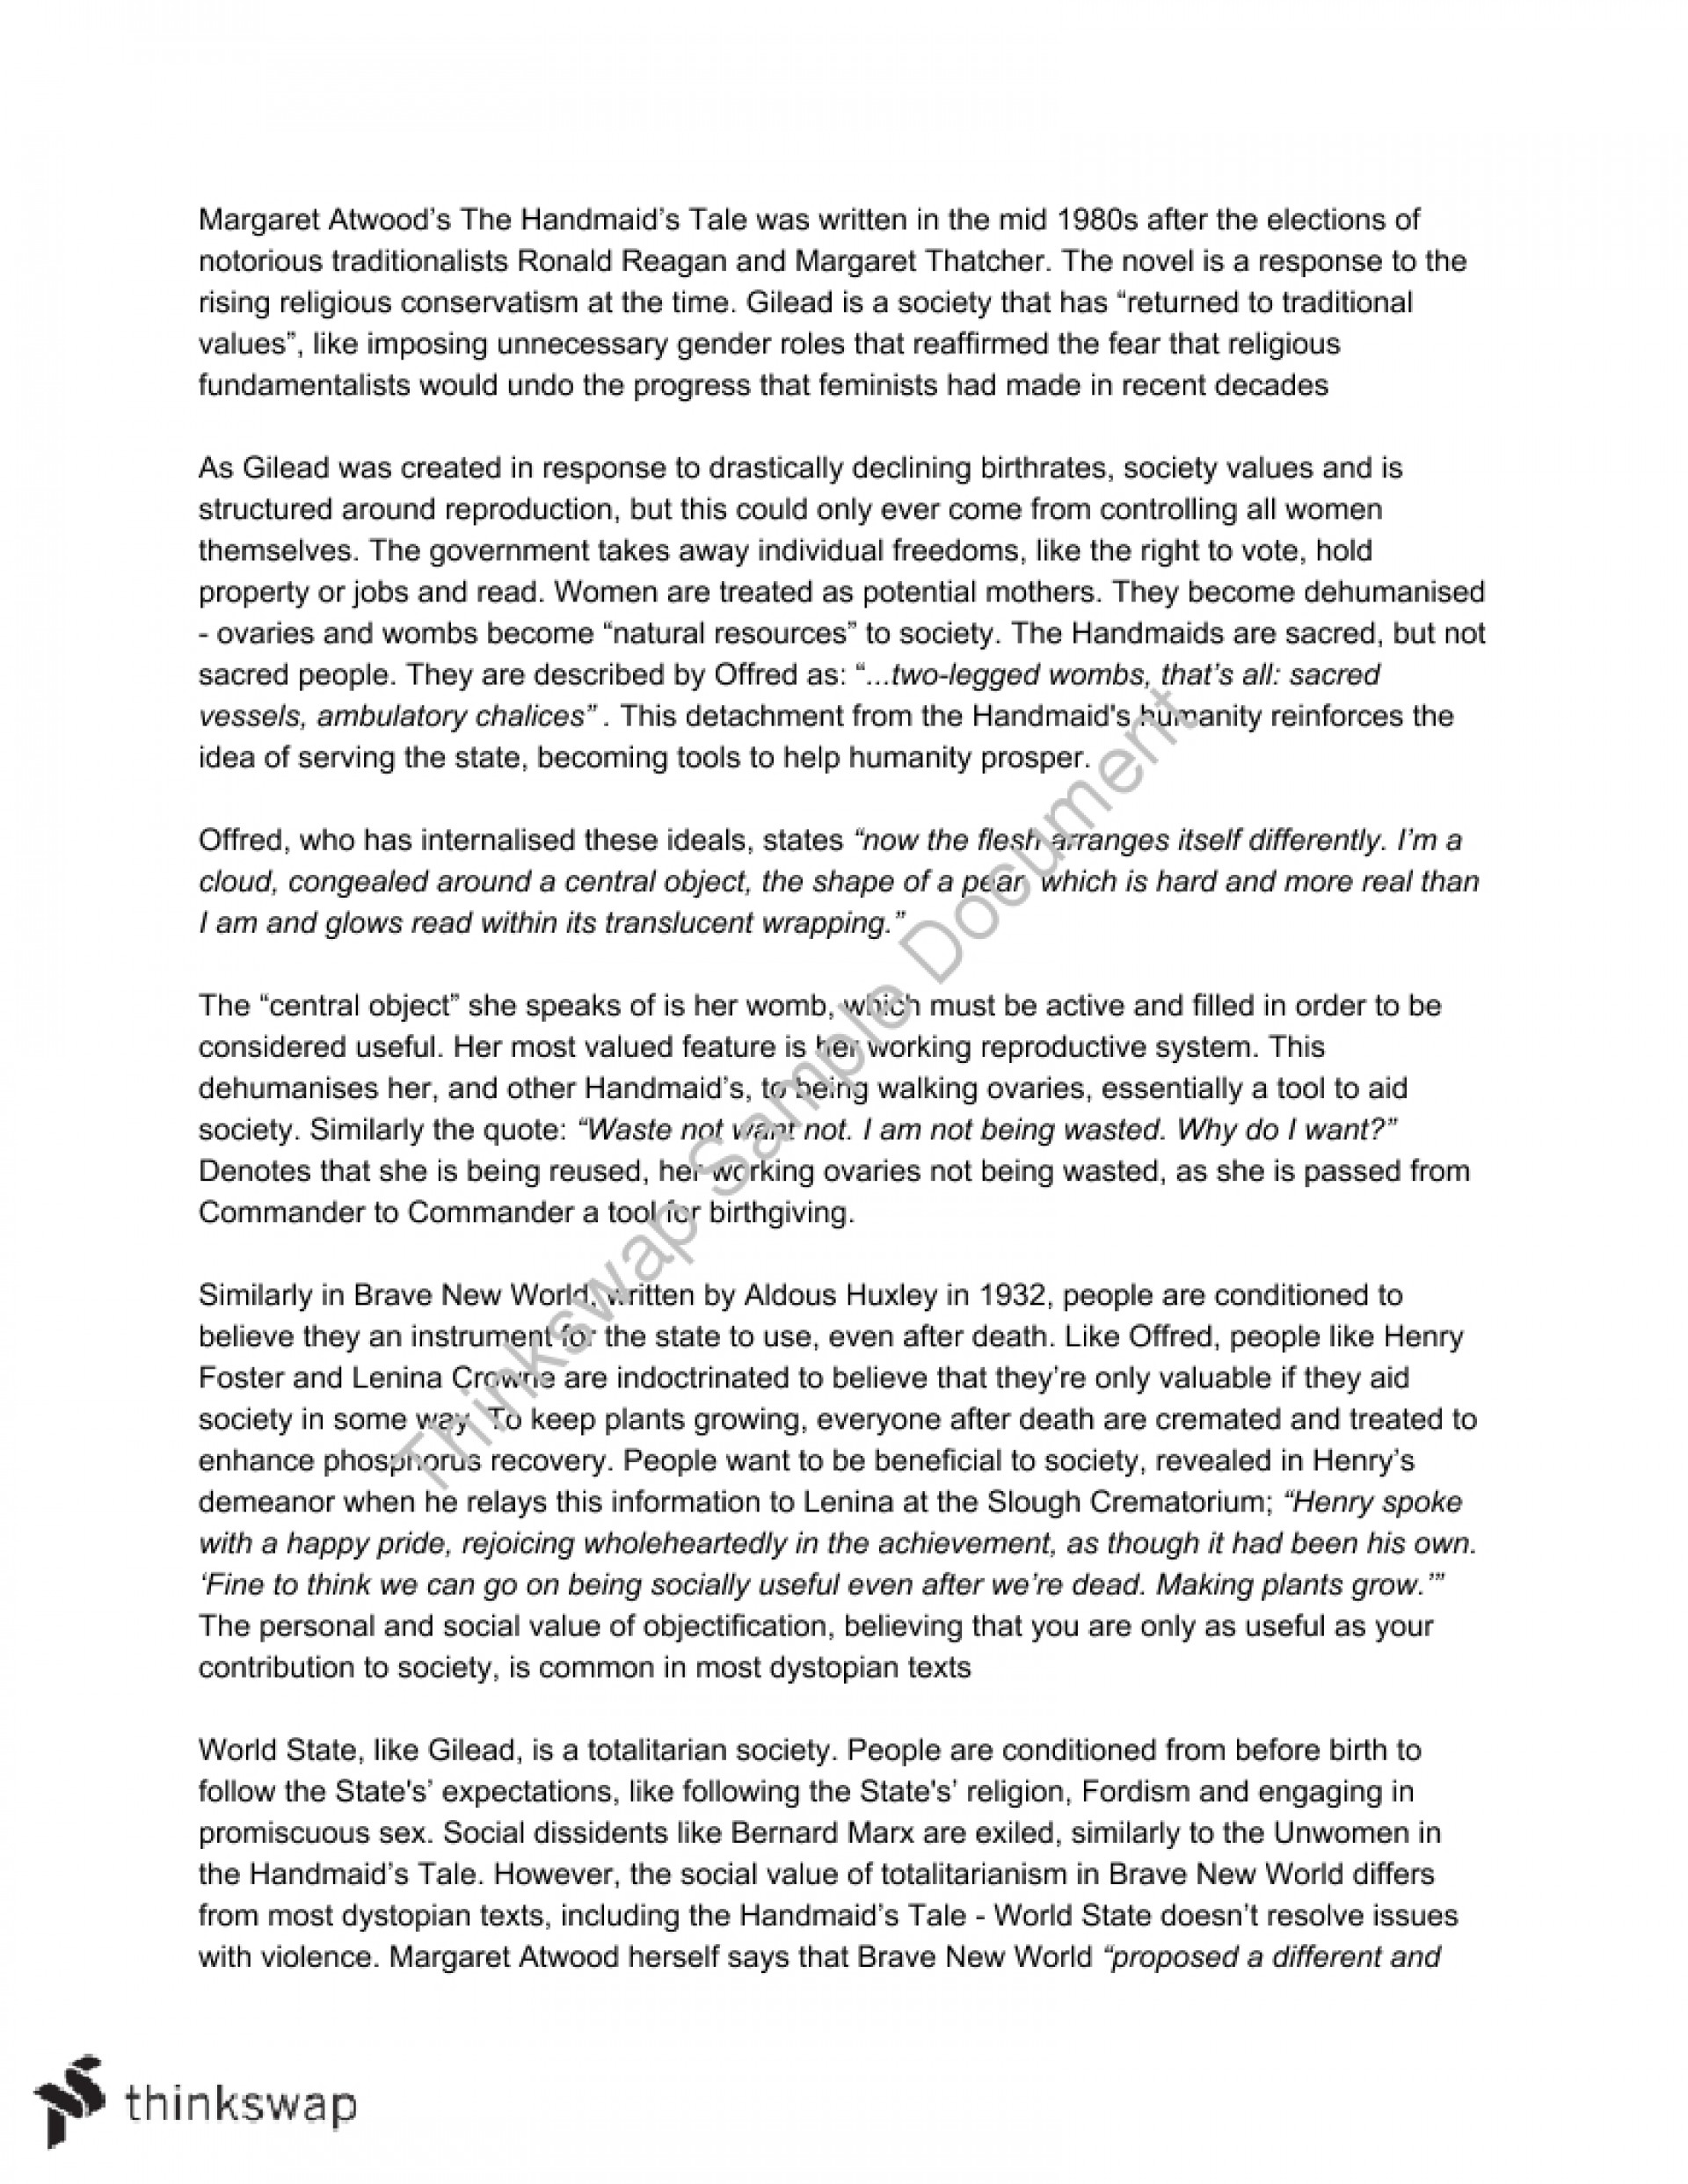 001 Essay Example 53179 Extensionassignment21 The Handmaids Astounding Tale Handmaid's On Religion Pdf Thesis 1920